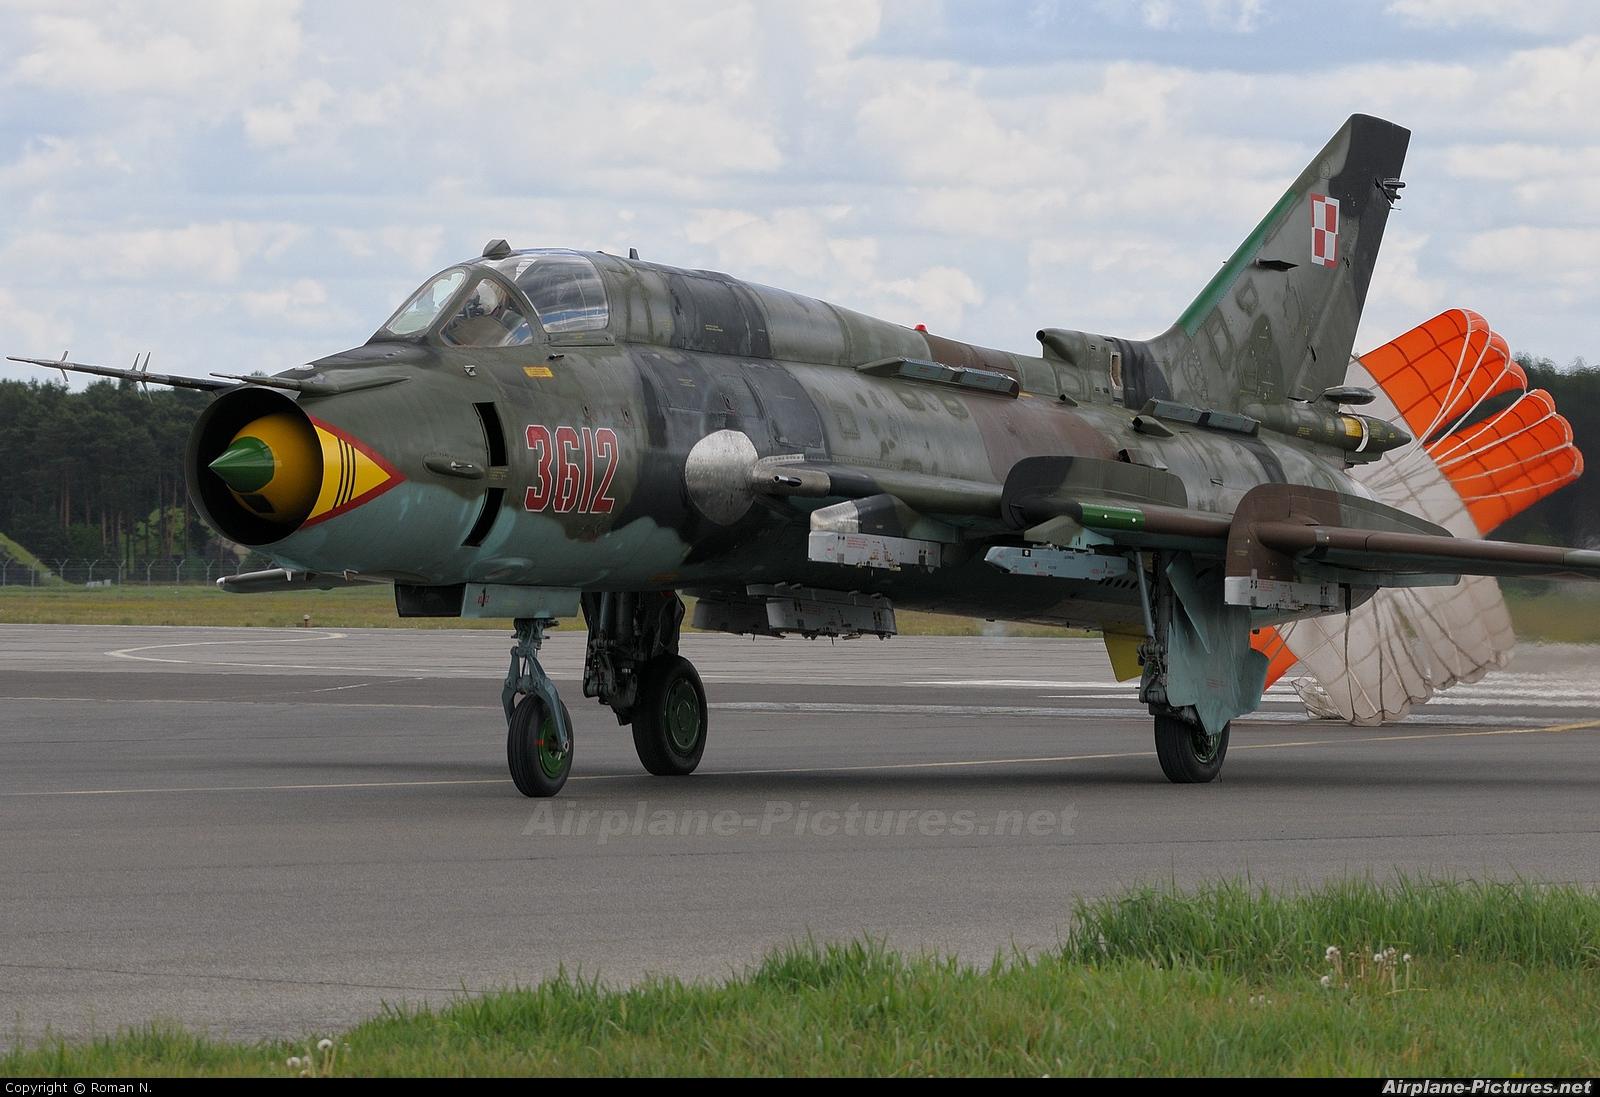 Poland - Air Force 3612 aircraft at Bydgoszcz - Szwederowo